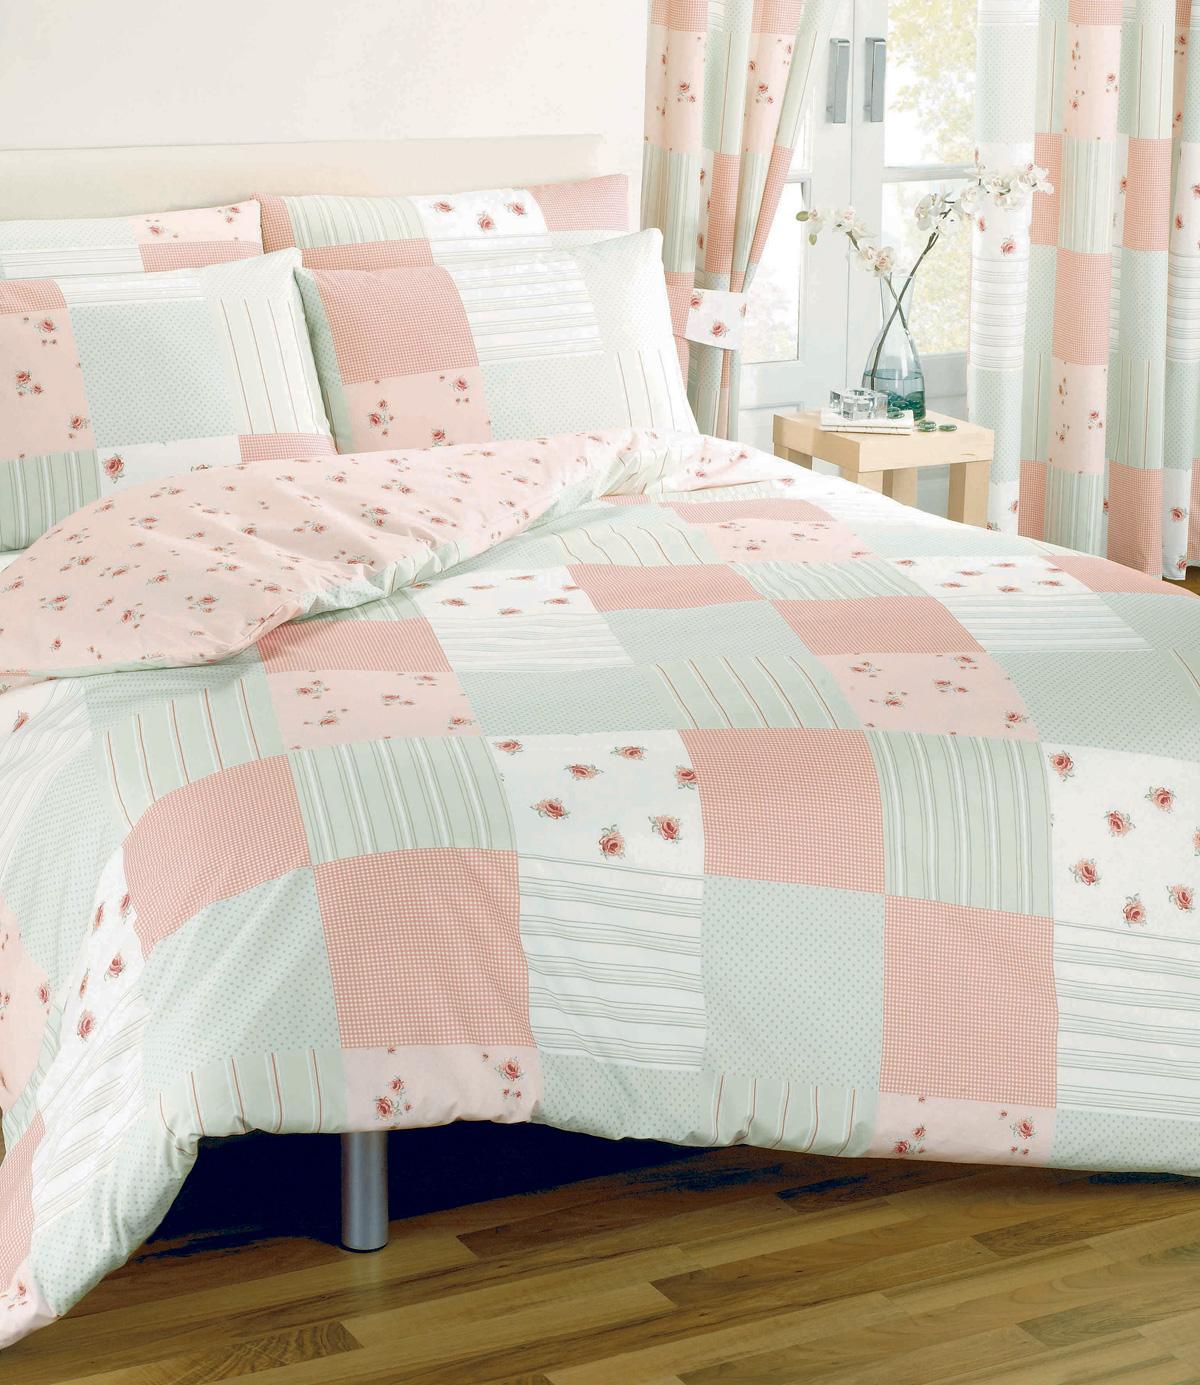 Pink Patchwork Duvet Cover